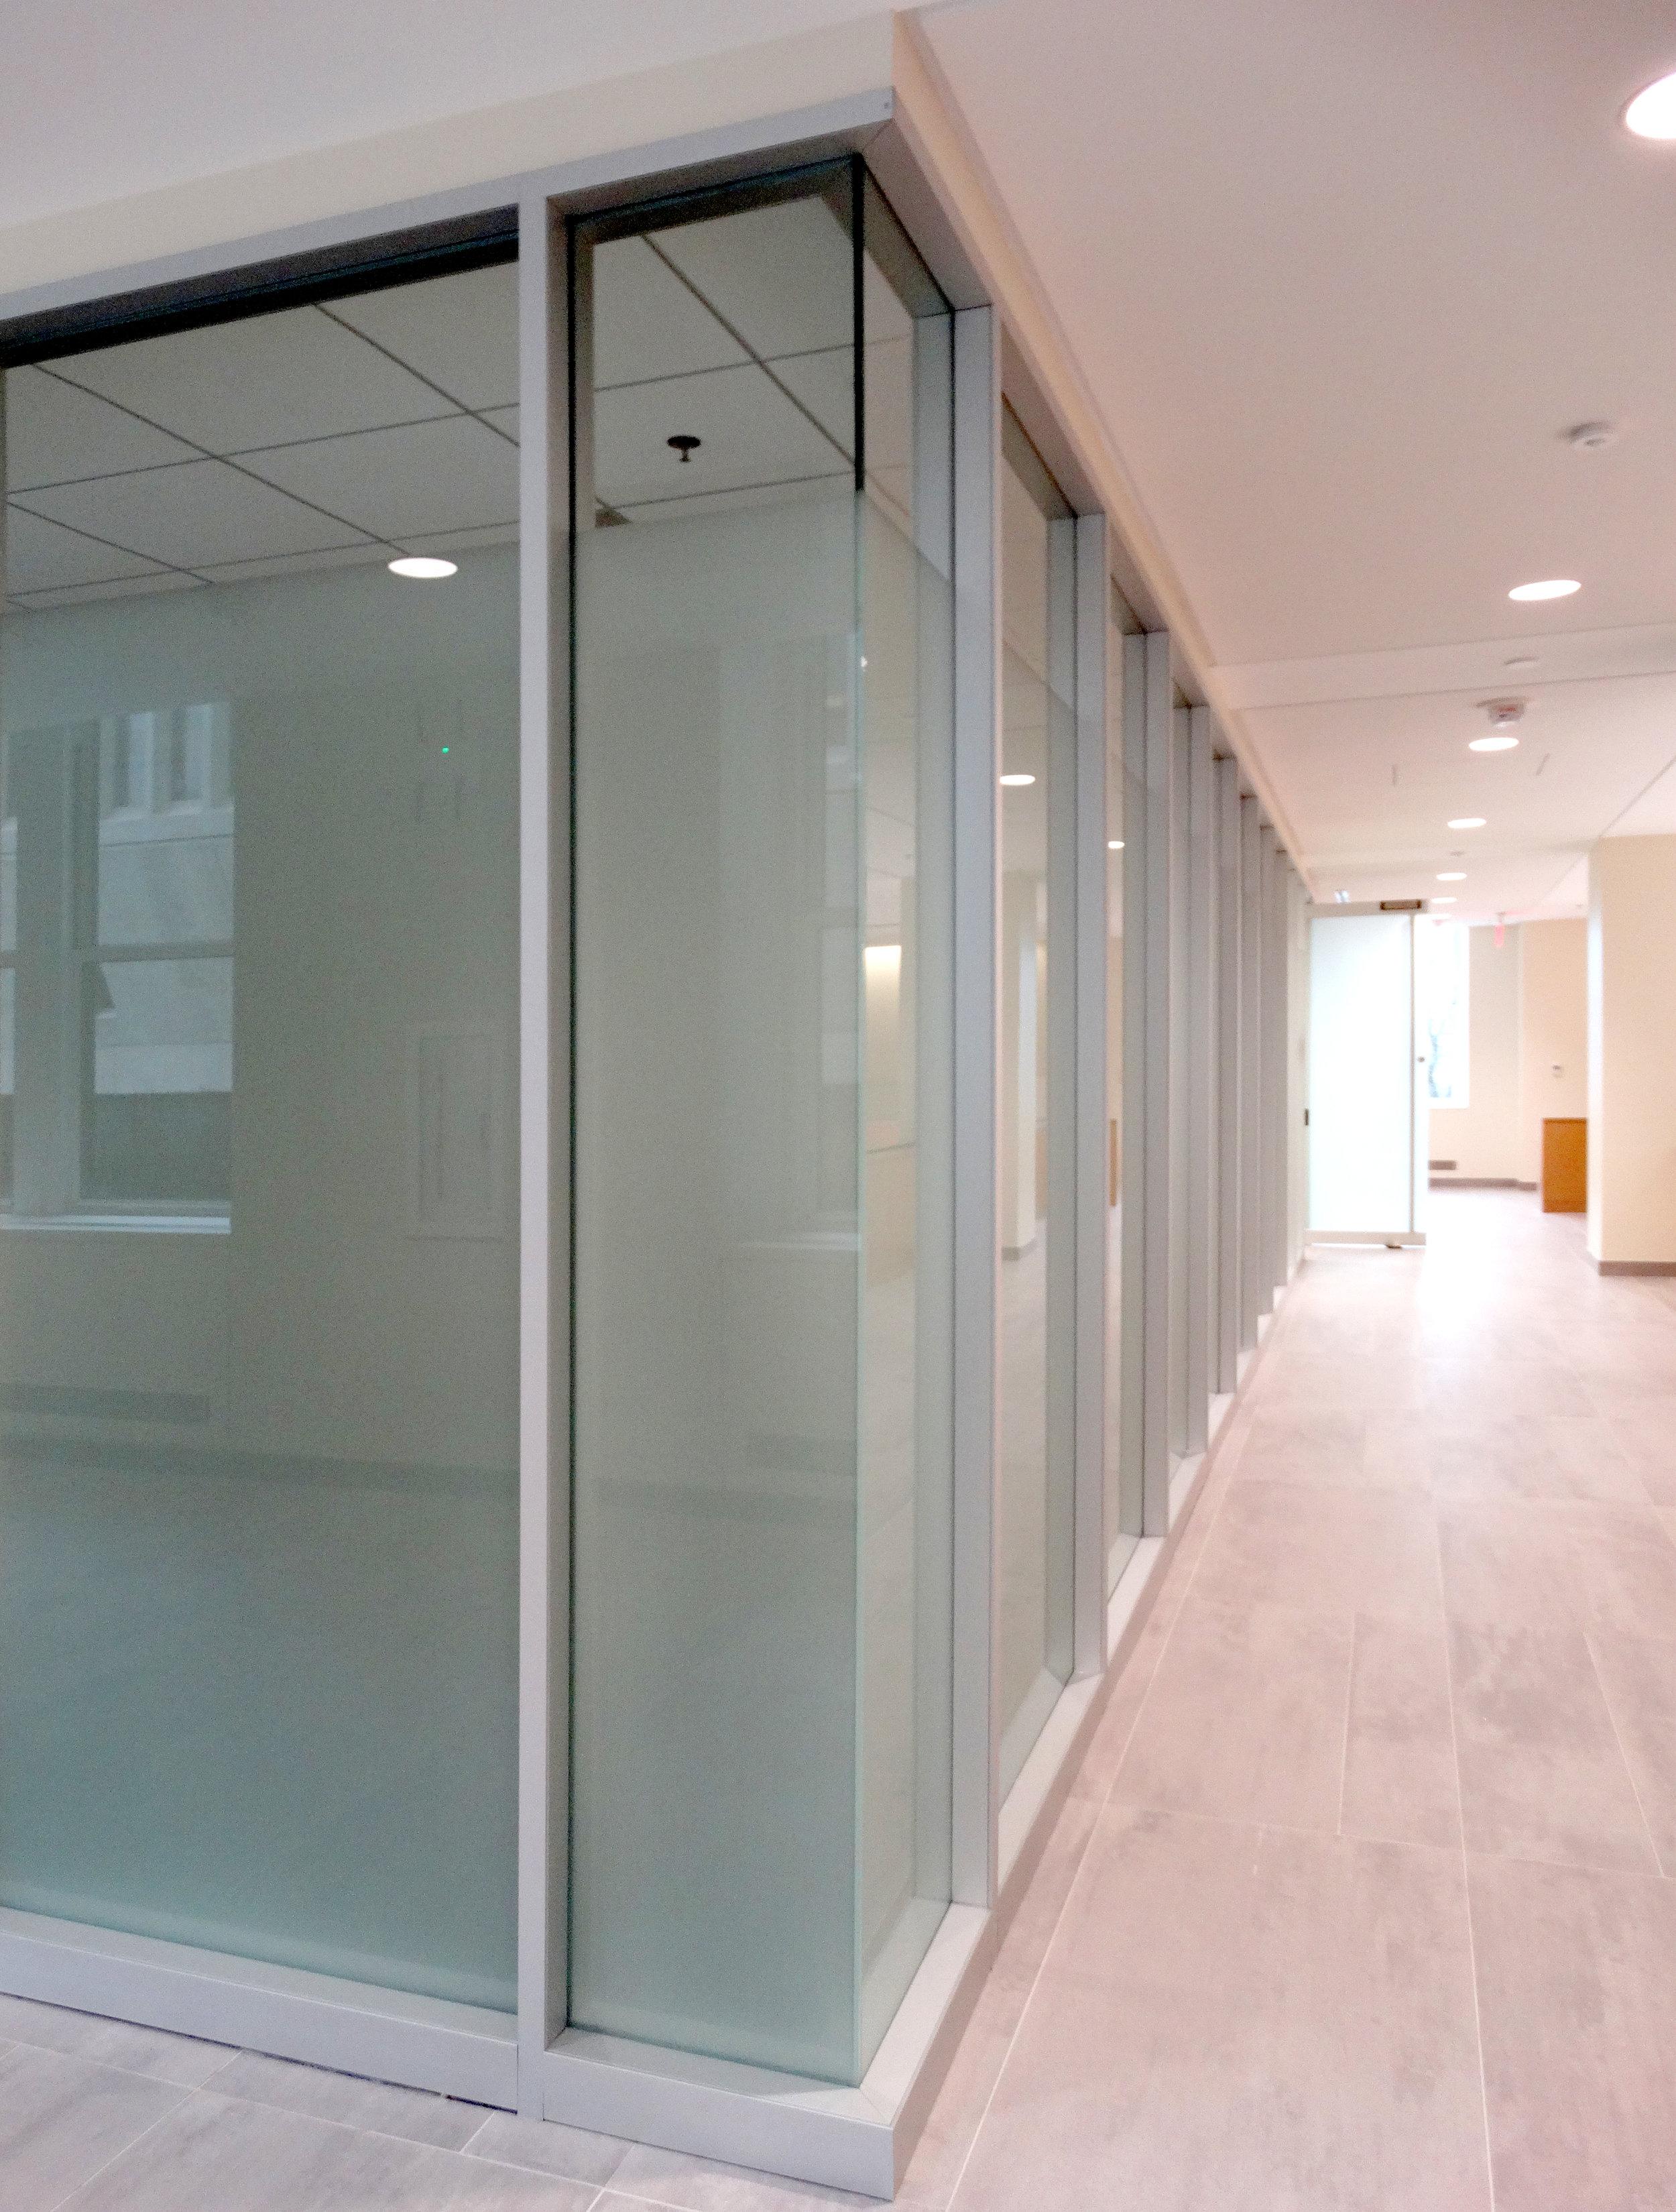 Encase Aluminum Glass Wall System - Spaceworks AI.jpg